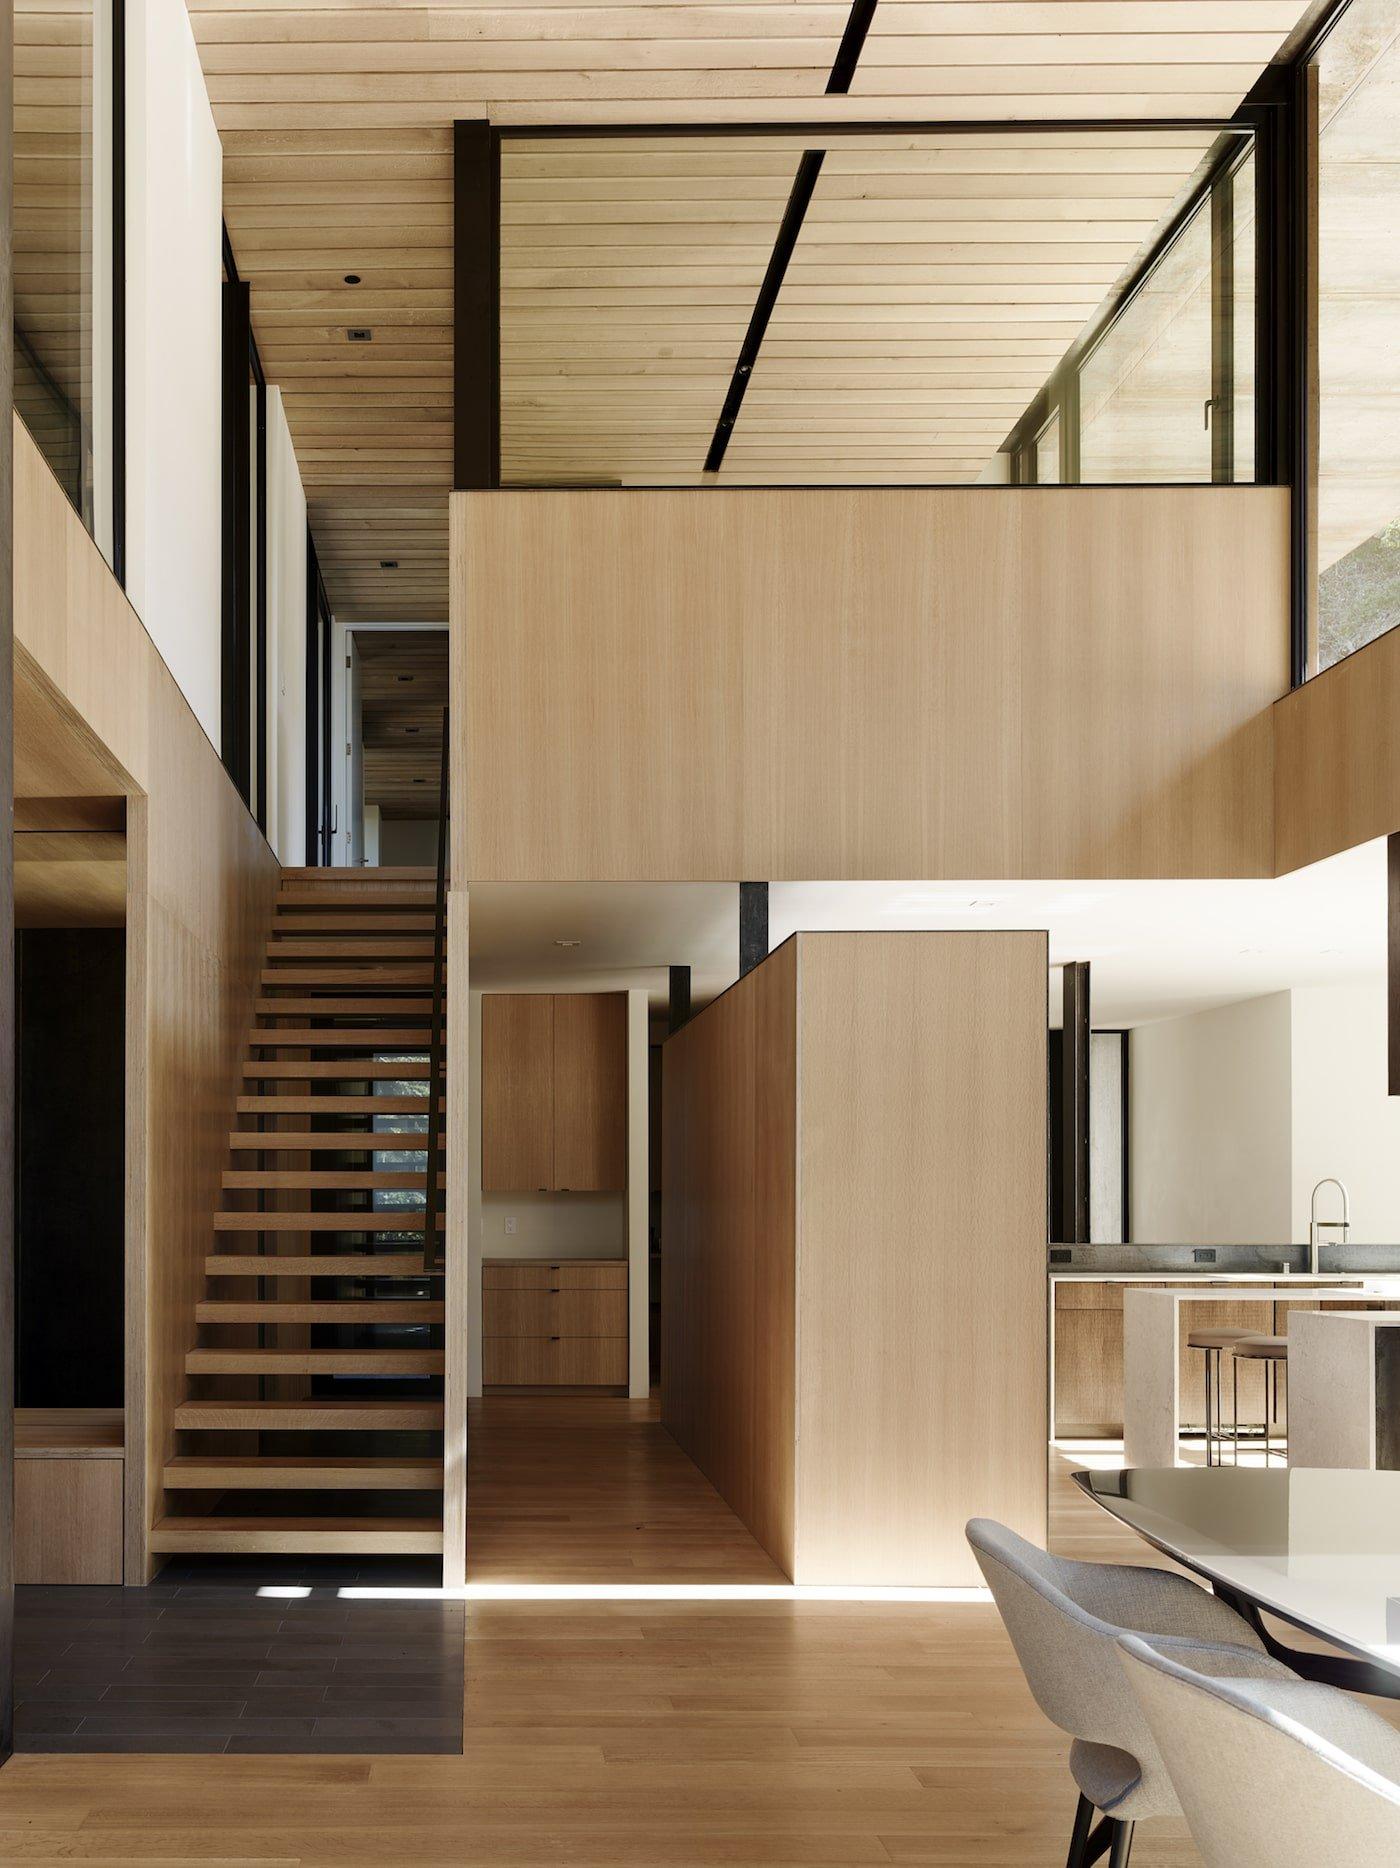 Timber interior of net-zero home